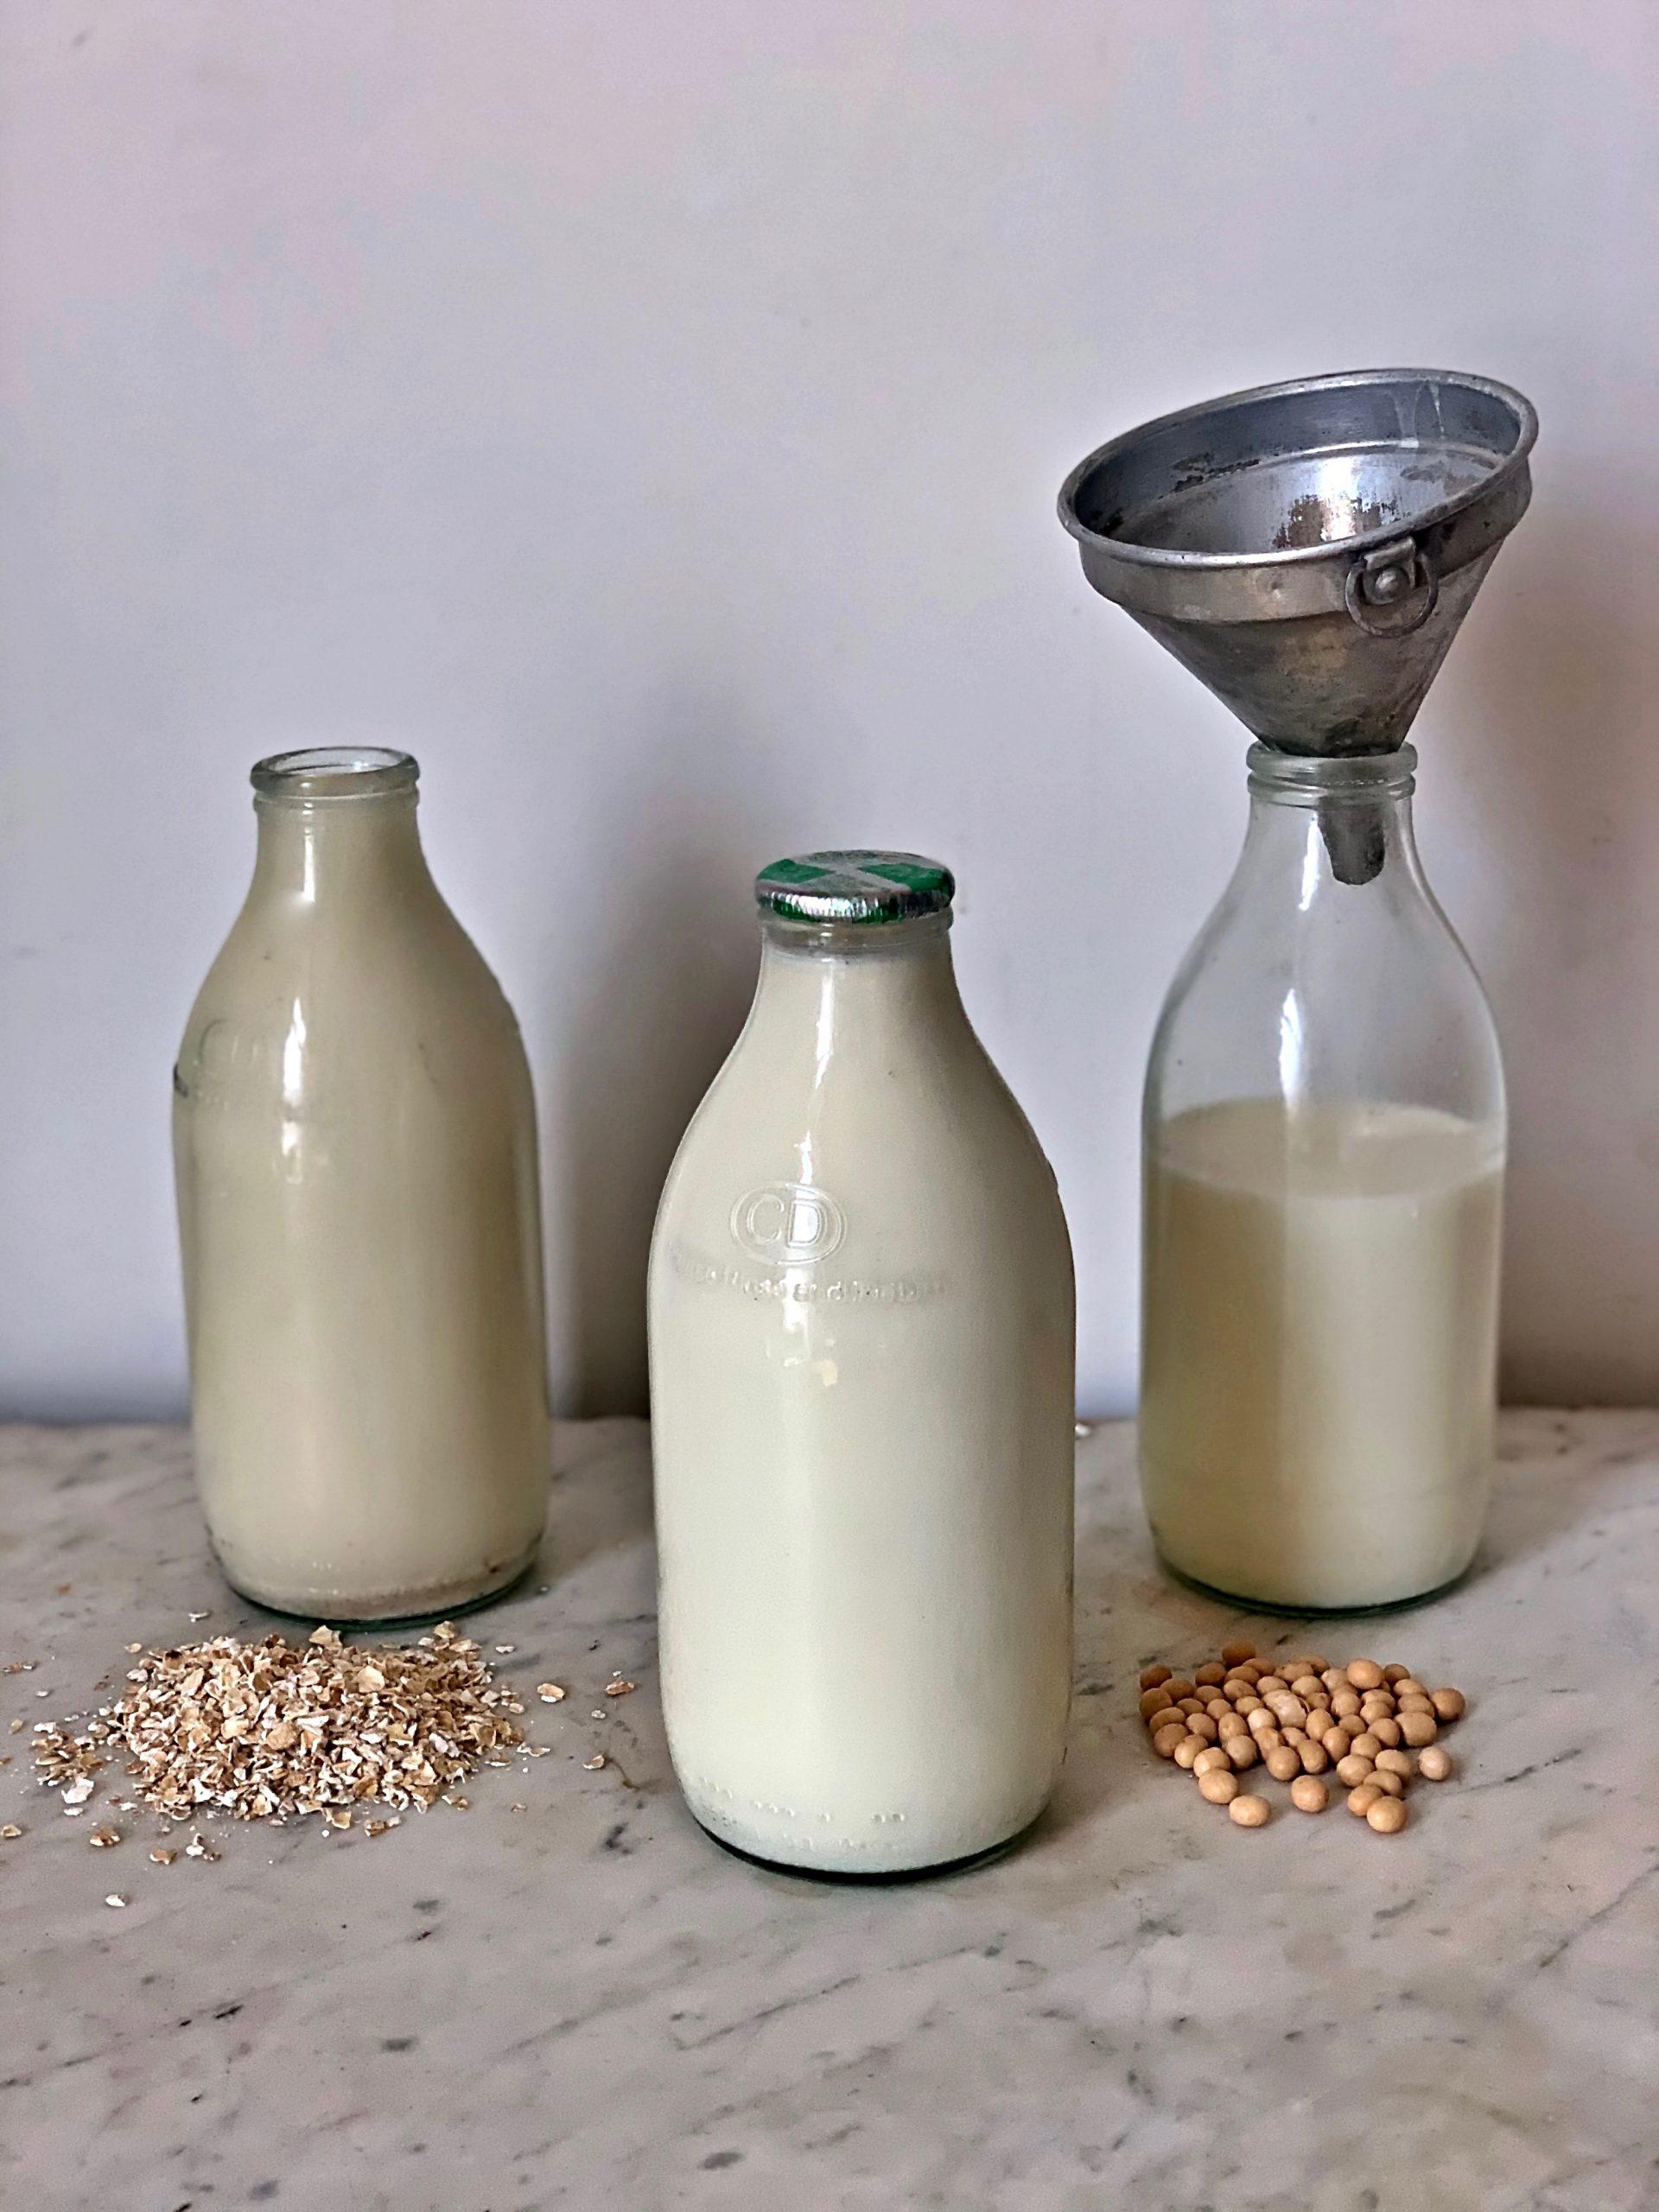 dairy milk, oat milk, soy milk pic: Kerstin rodgers/msmarmitelover.com